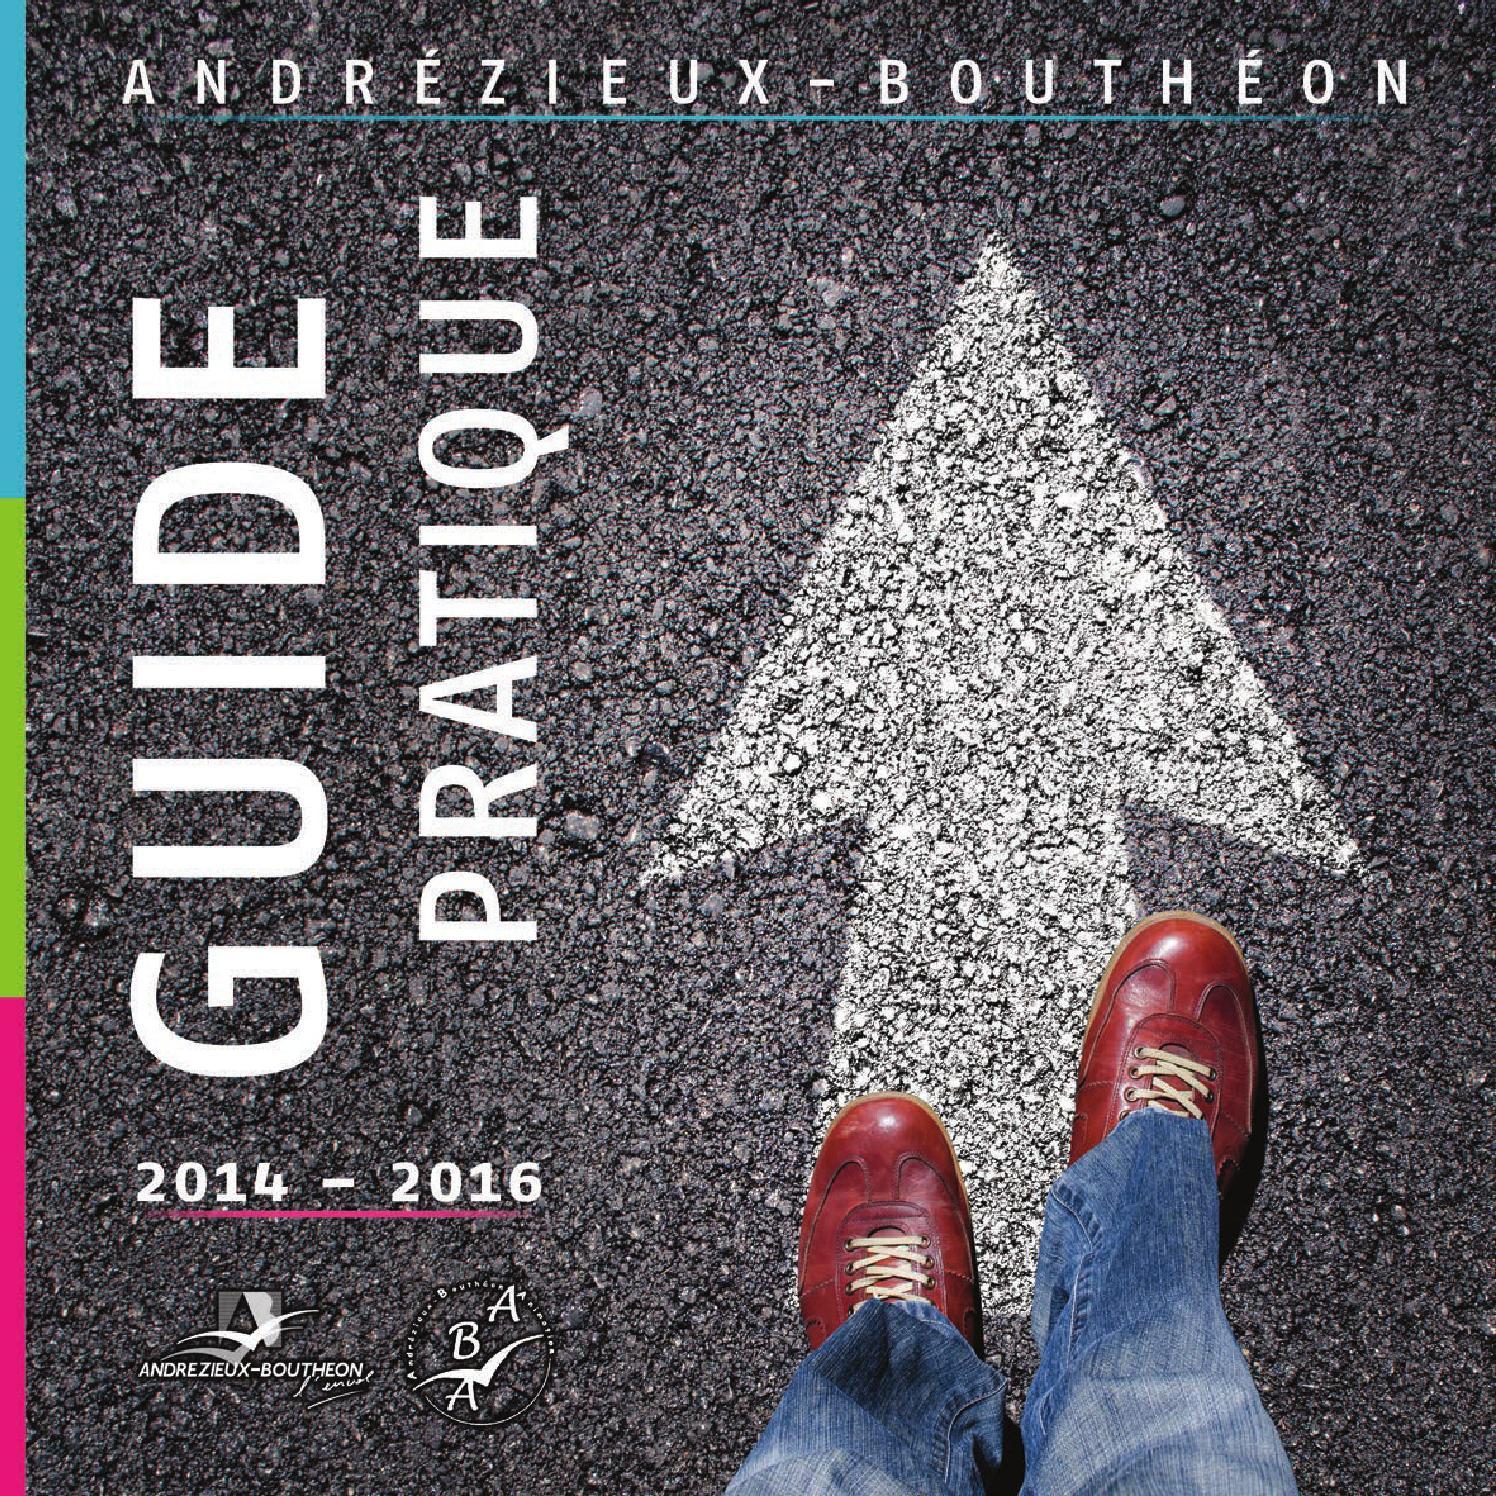 Andrezieux Guide Pratique 2014 2016 By CGEO